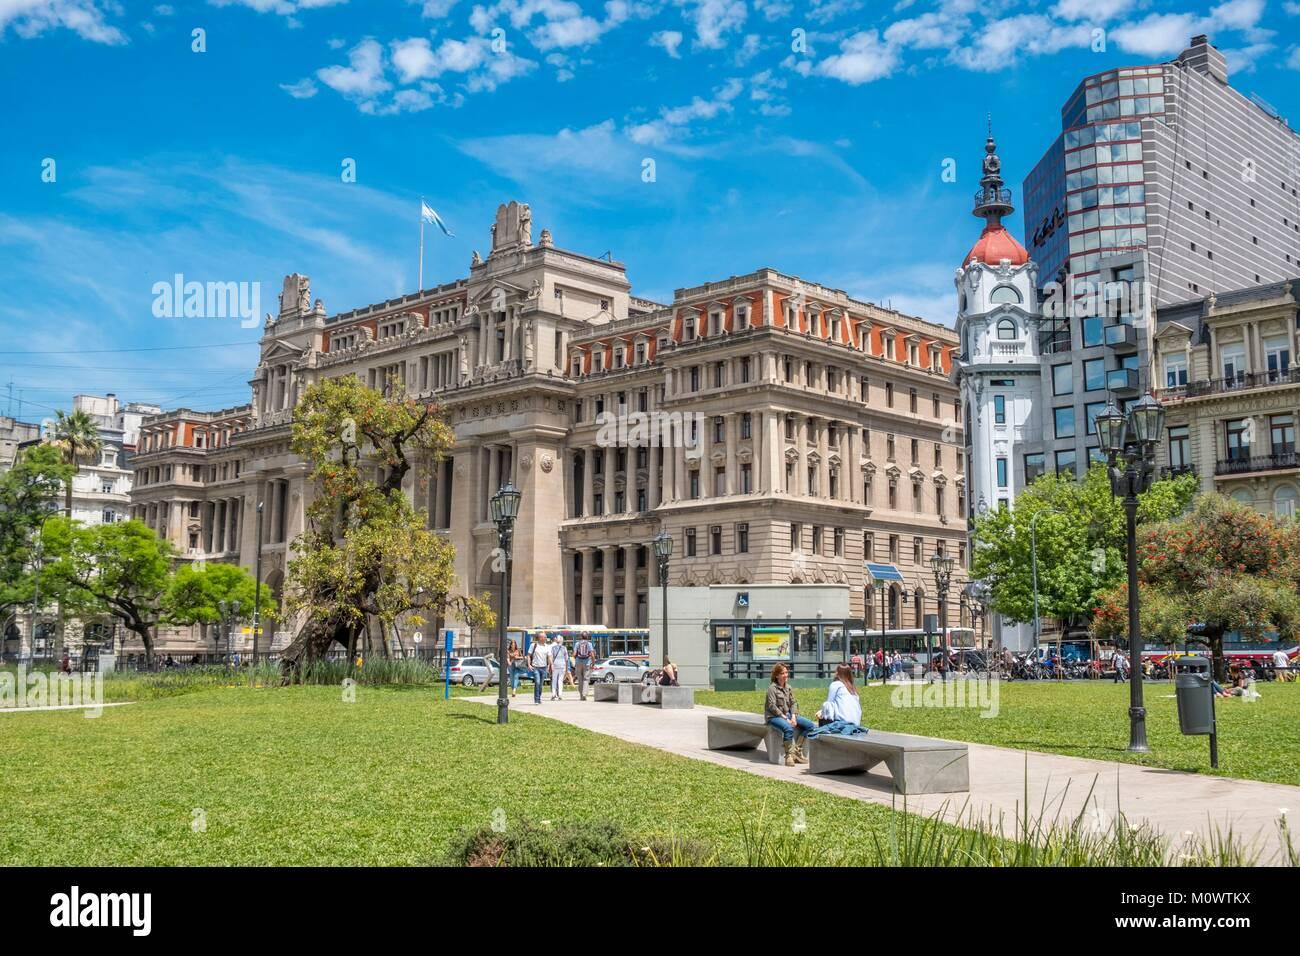 L'Argentina,provincia di Buenos Aires,Buenos Aires,Tribunales,plaza Lavalle Immagini Stock